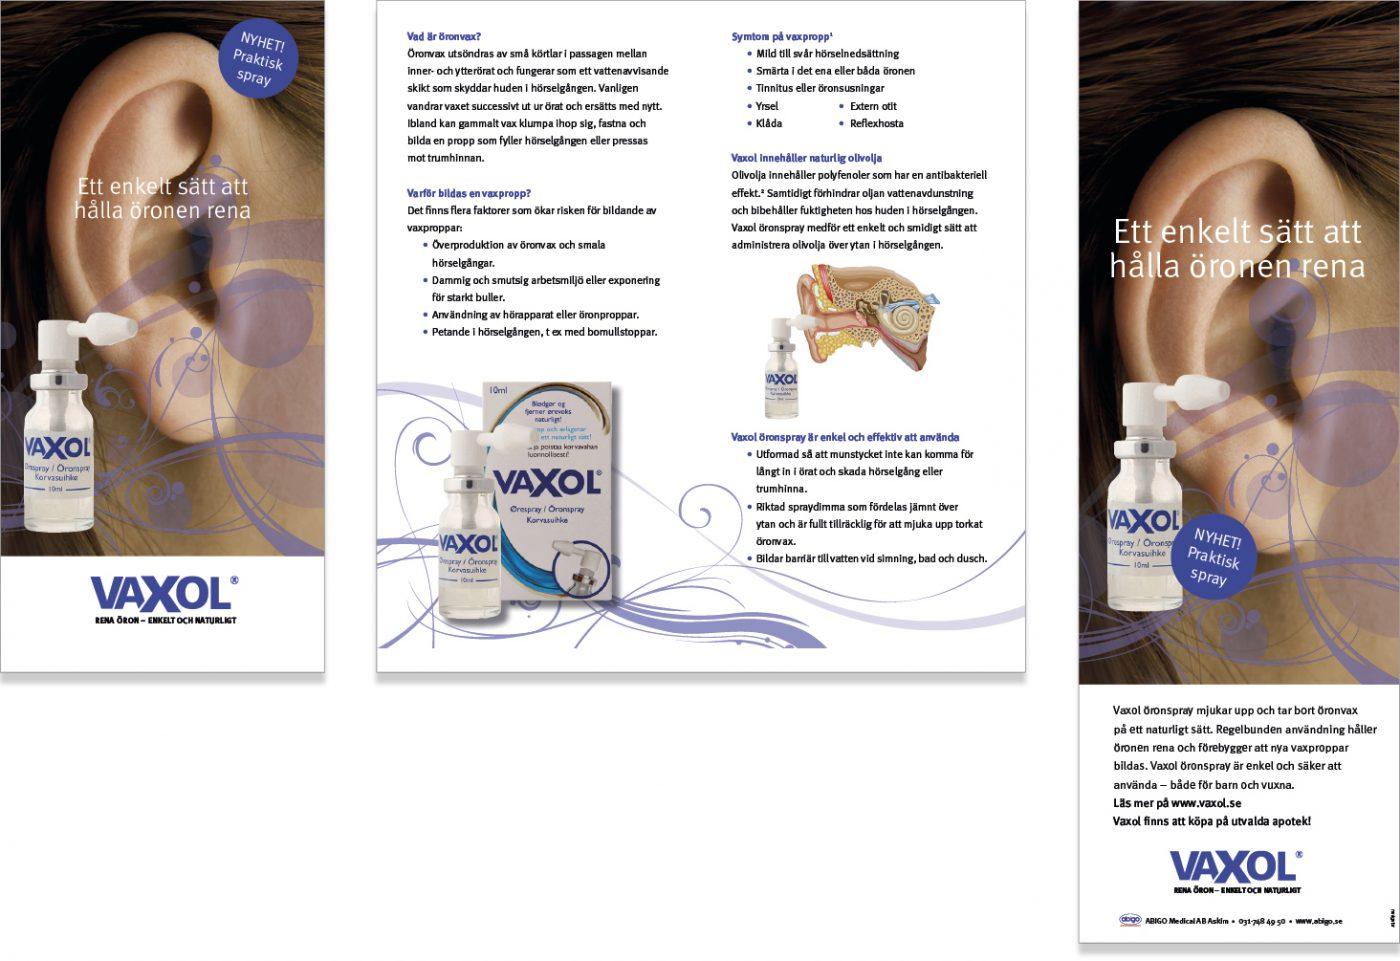 Abigo Medical Vaxol